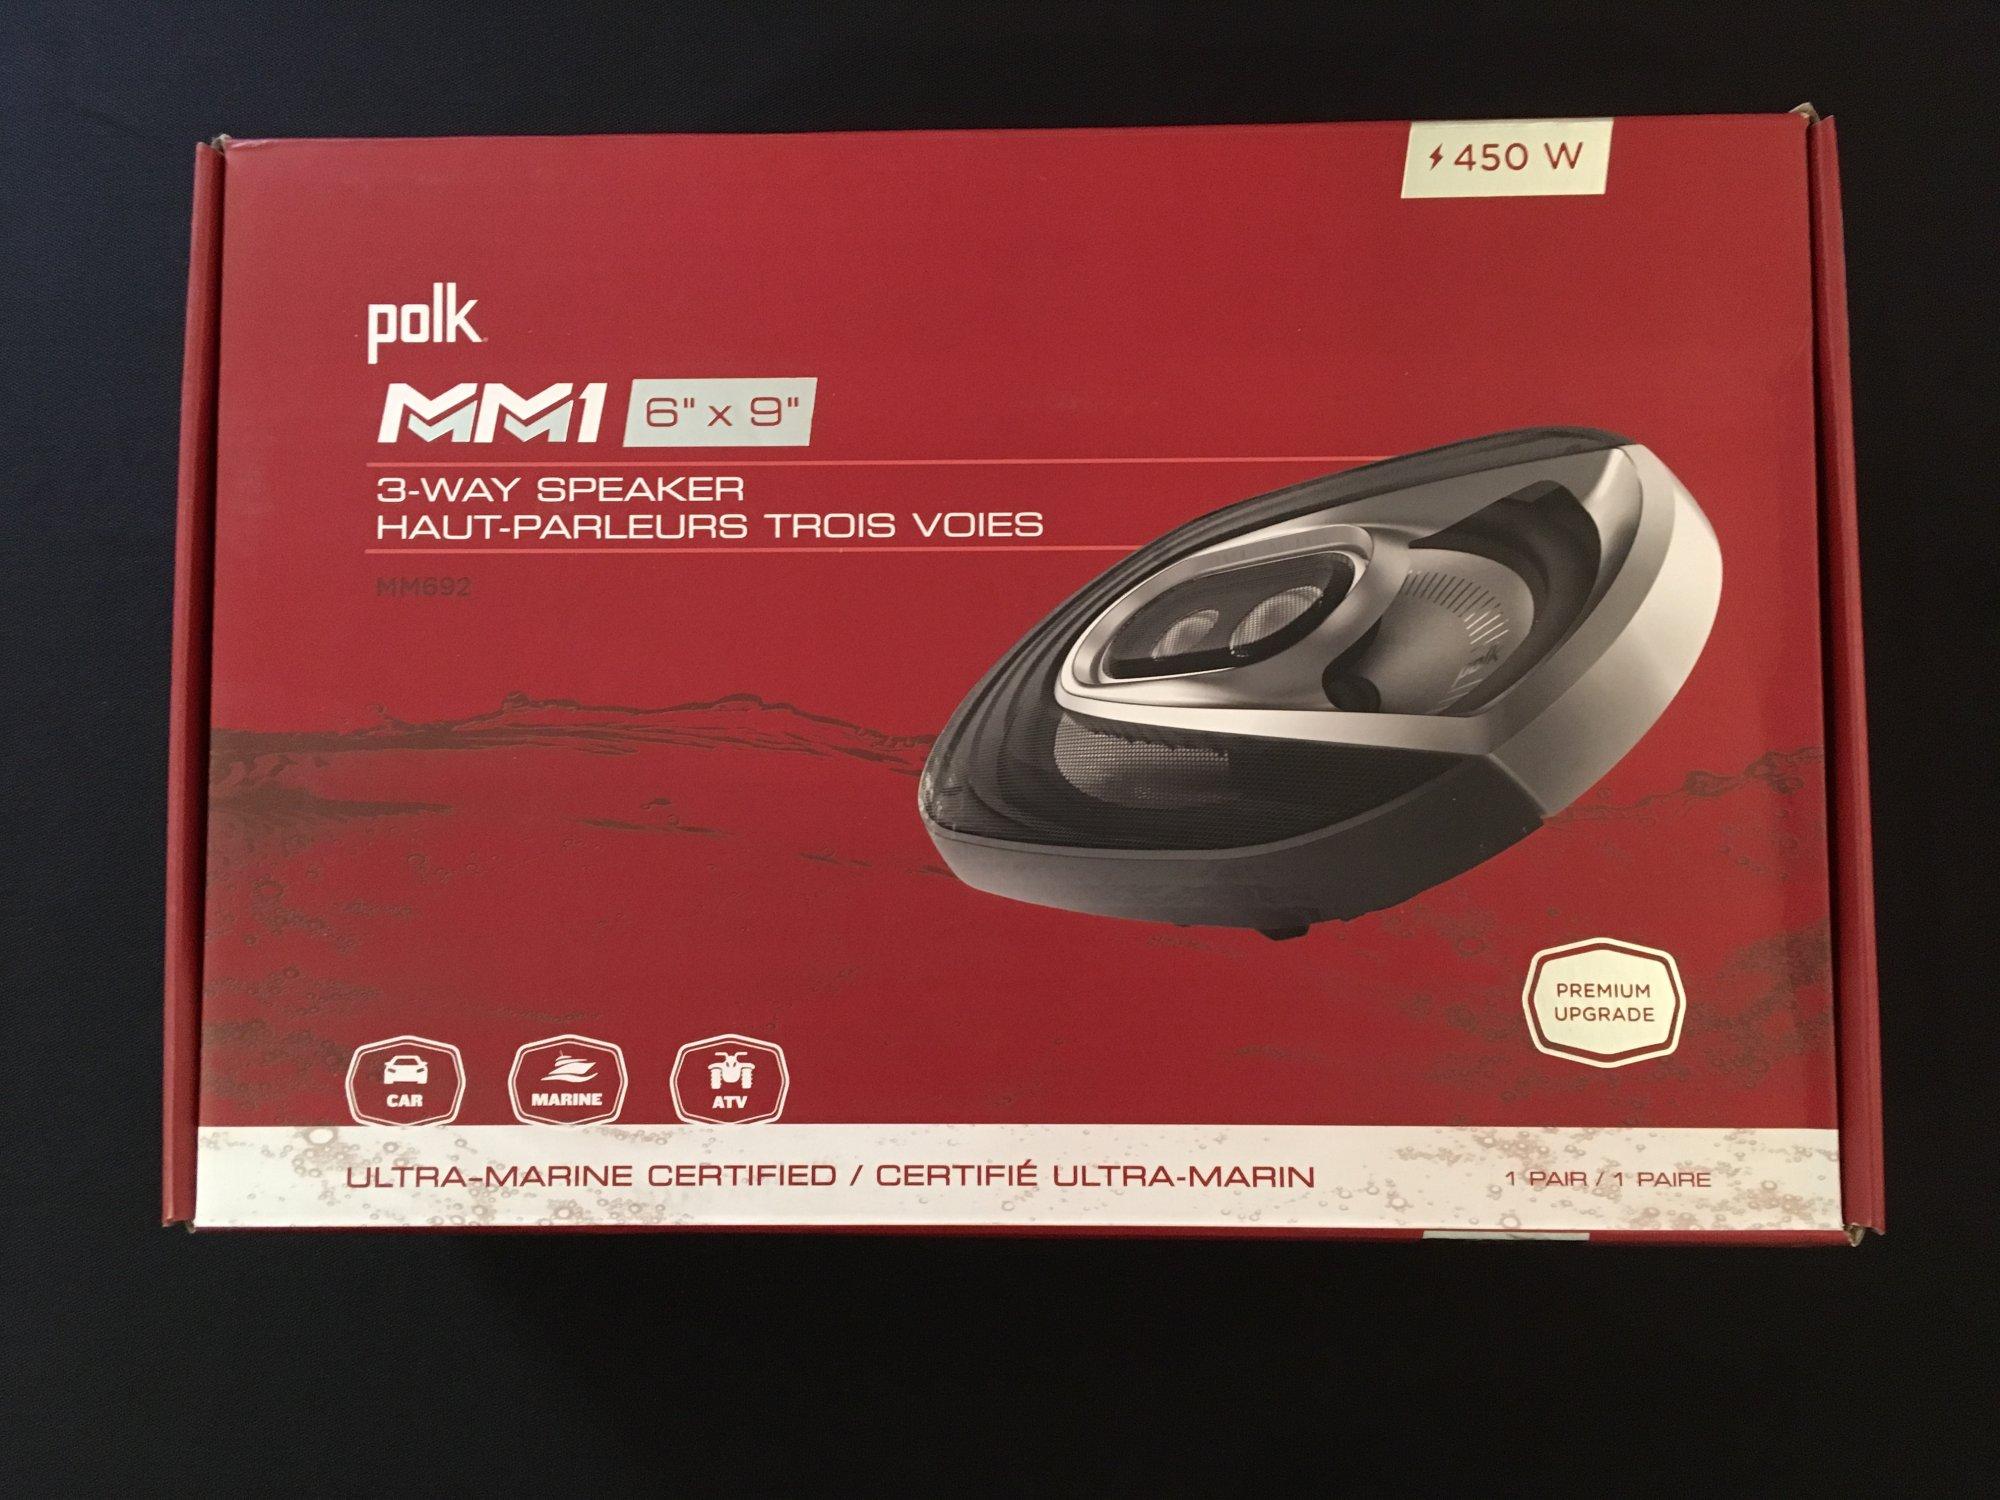 Polk MM692